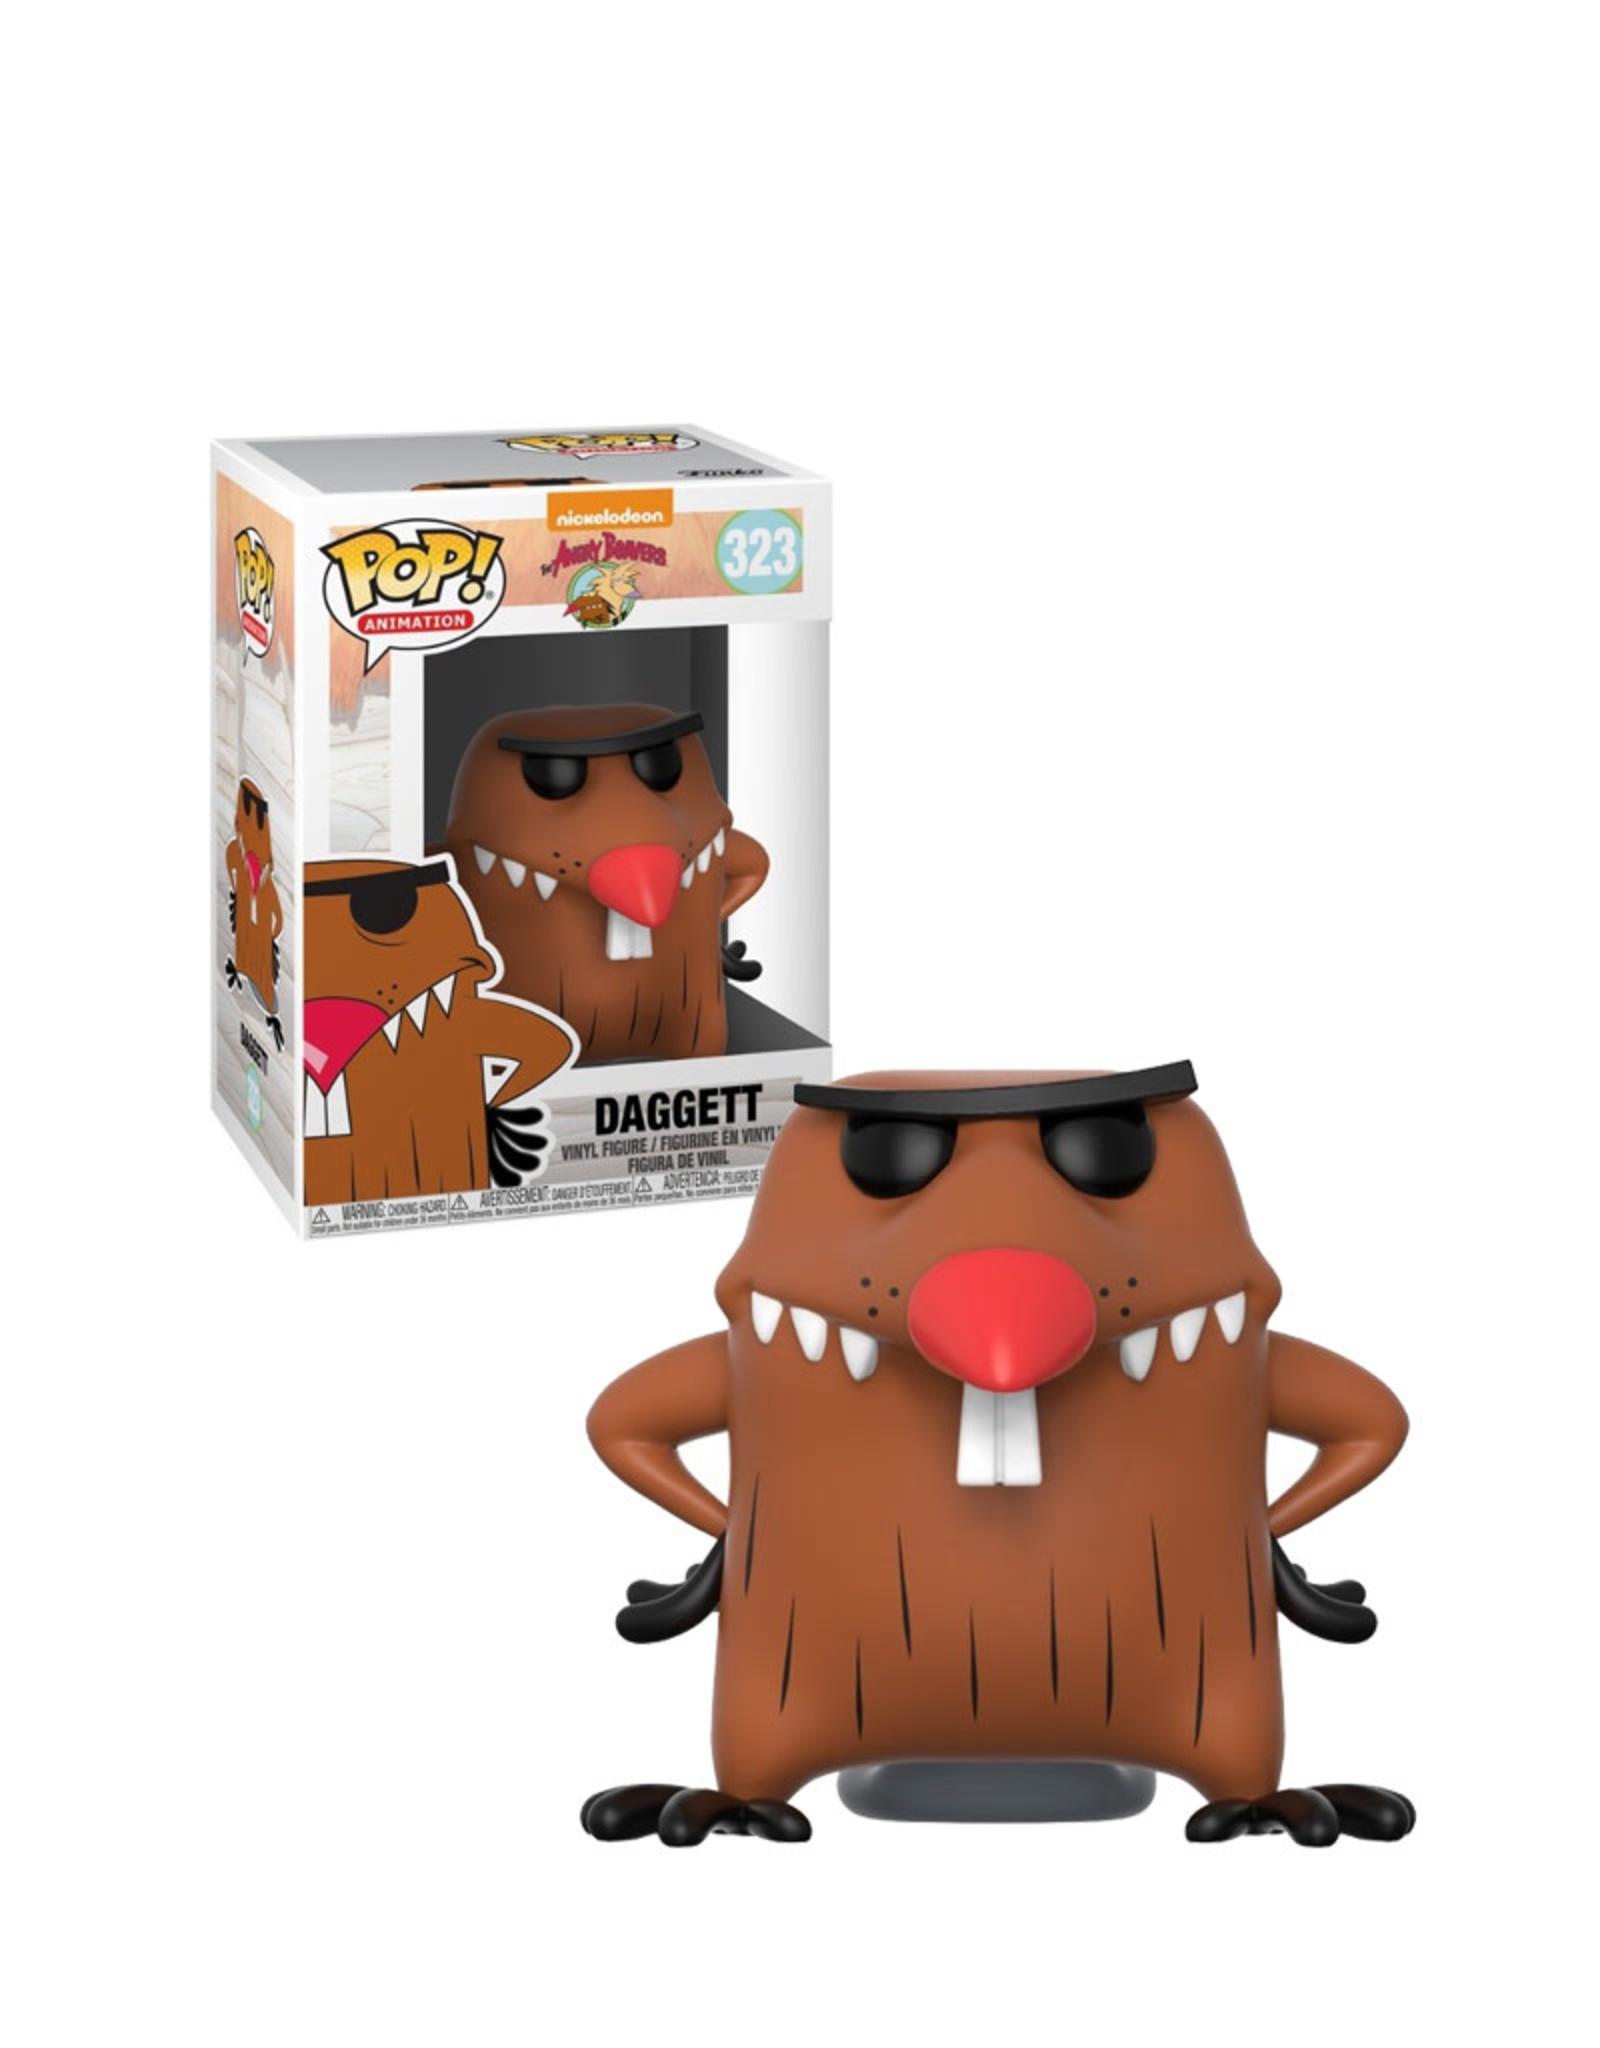 Daggett 323 ( Funko Pop ) The Angry Beaver